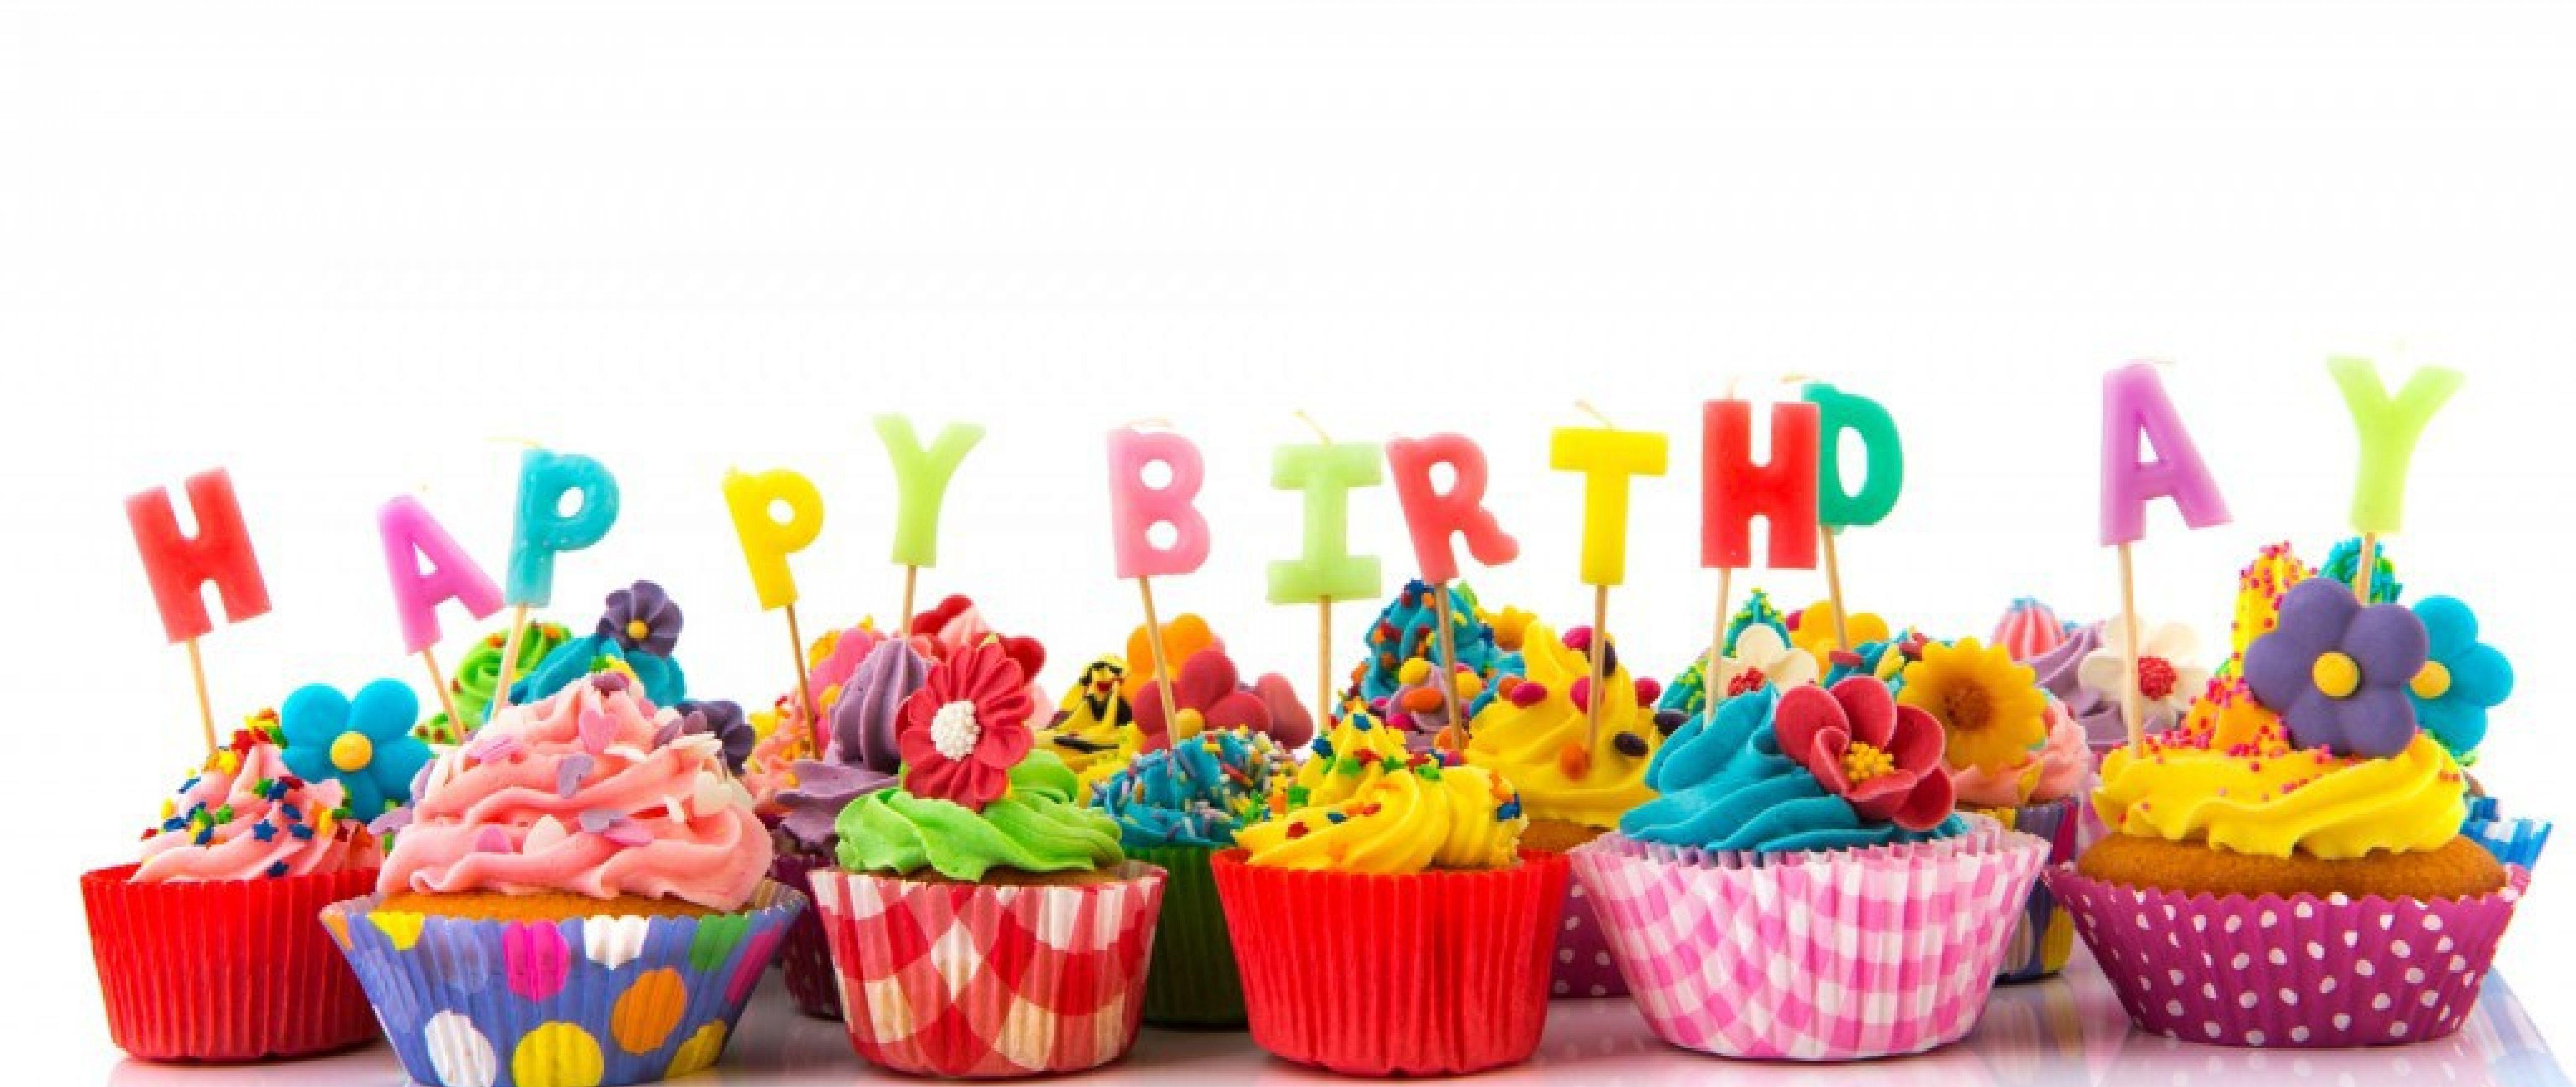 Happy monday d happy birthday to everyone who celebrates art